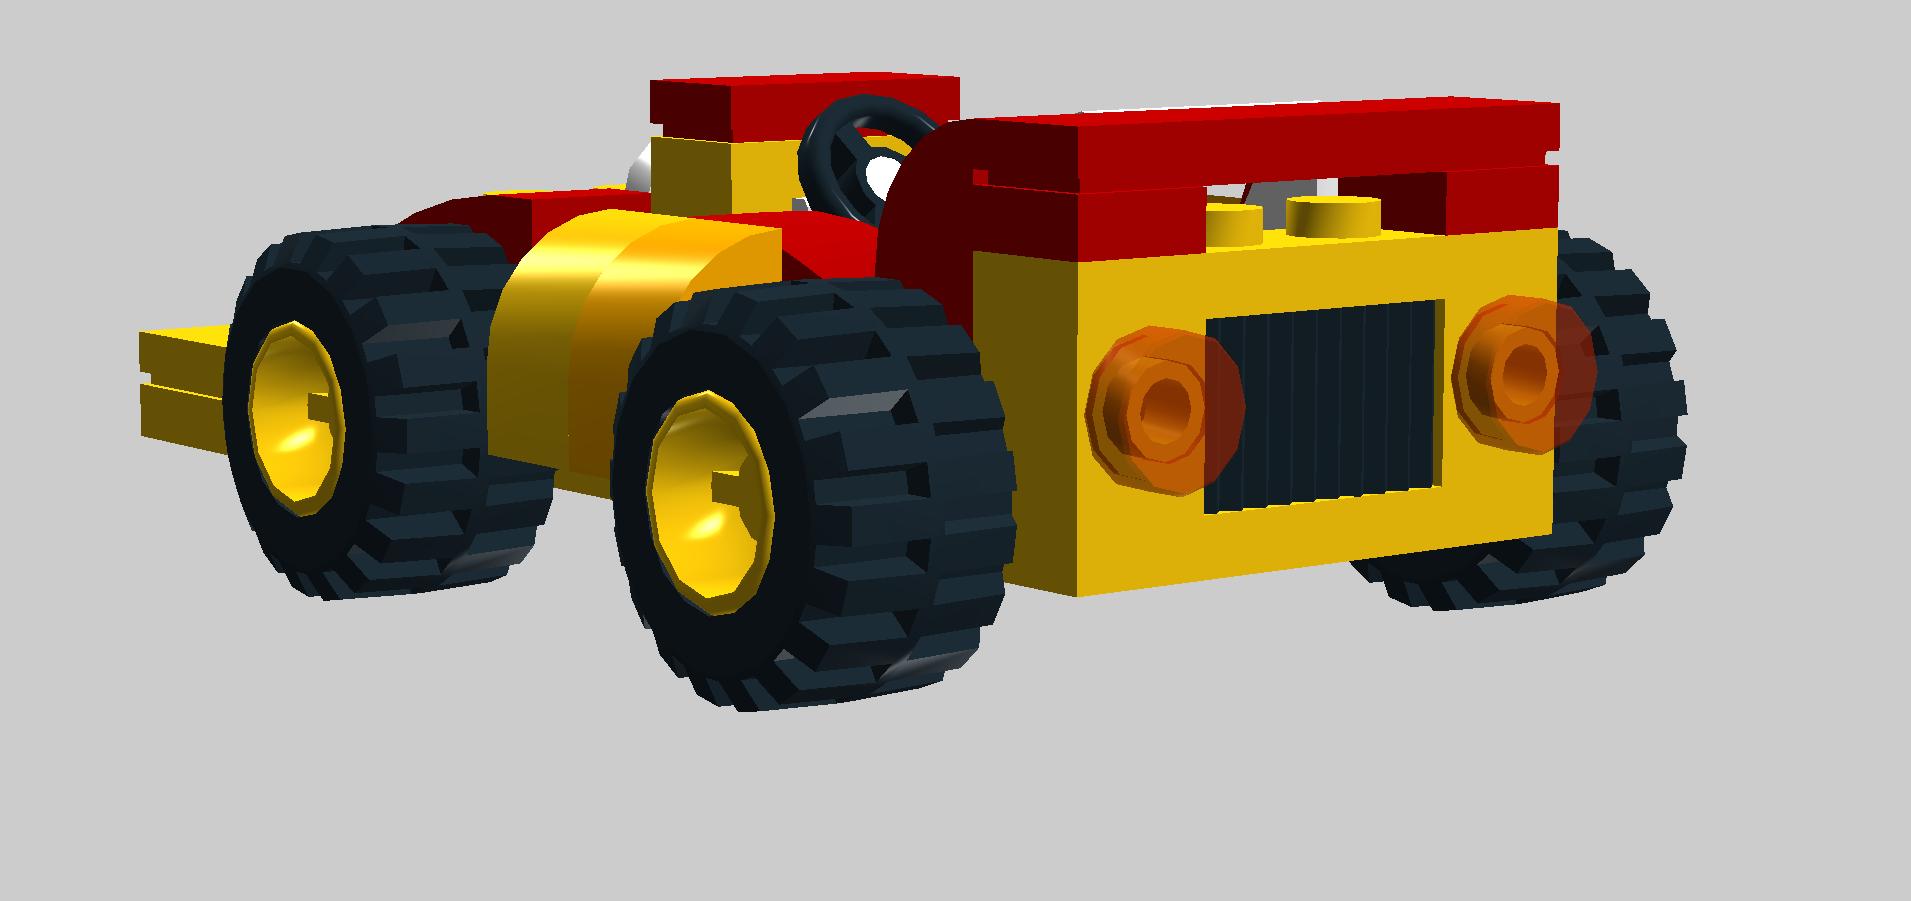 Lego car clipart image black and white MK Cartoon Gocart - Bricksafe image black and white